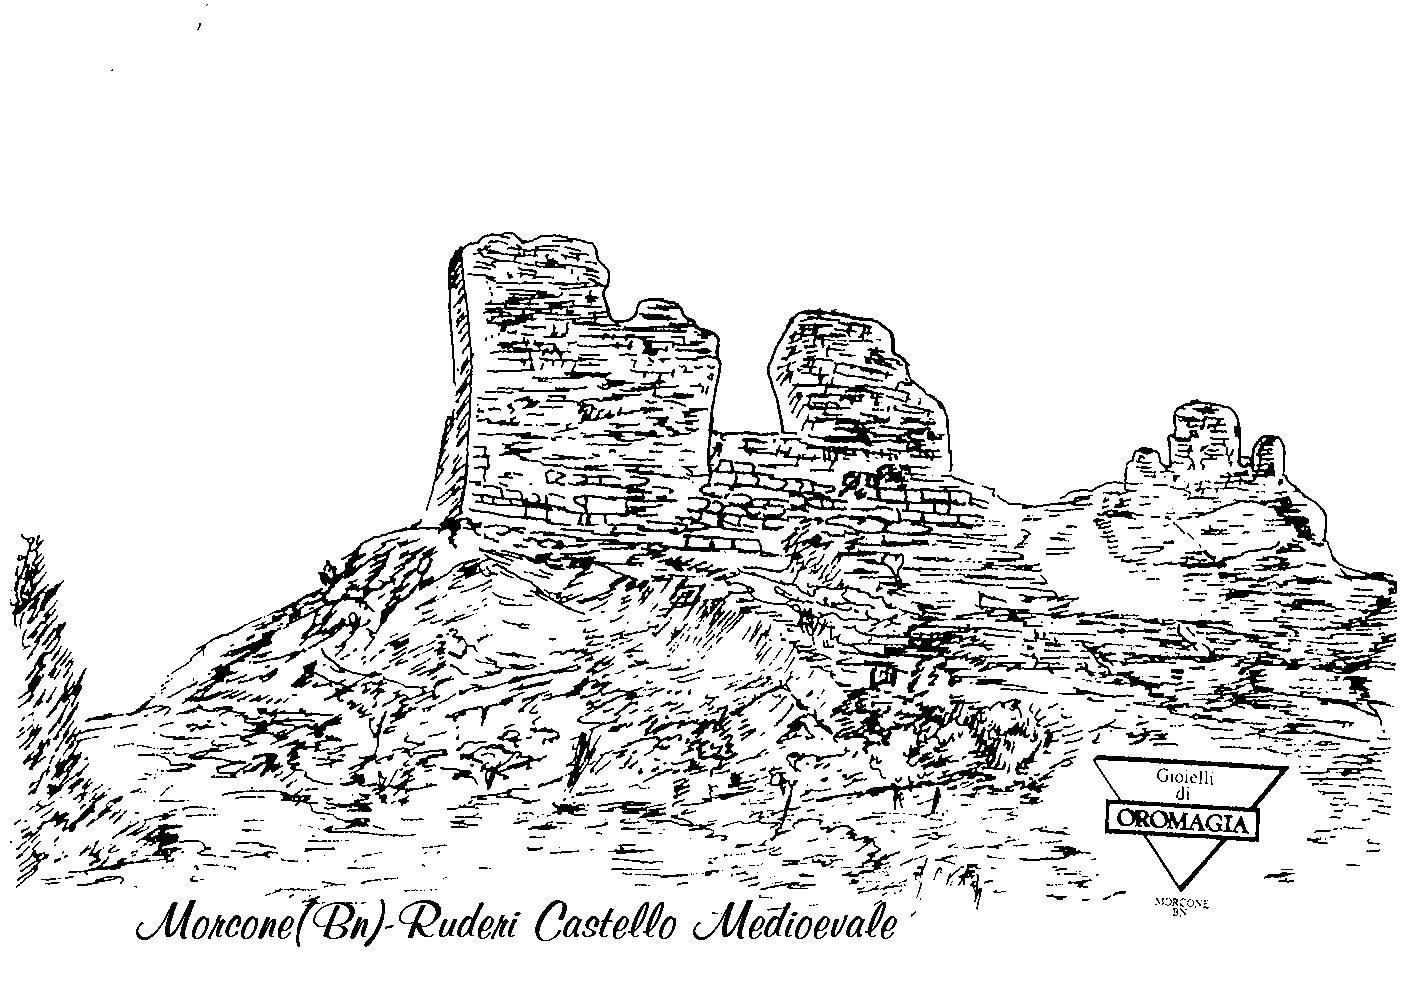 ruderi castello medioevale morcone in argento